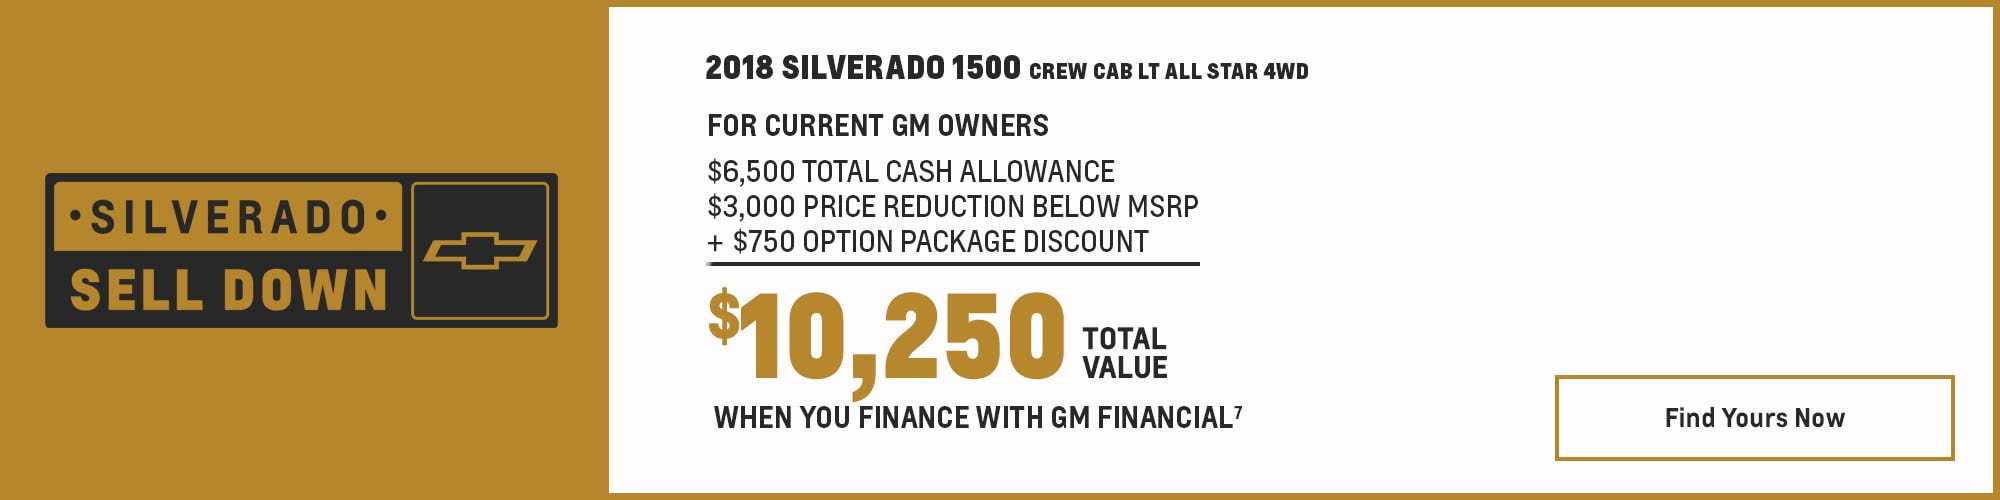 2018 Chevrolet Silverado 1500: $6,500 Total Cash Allowance